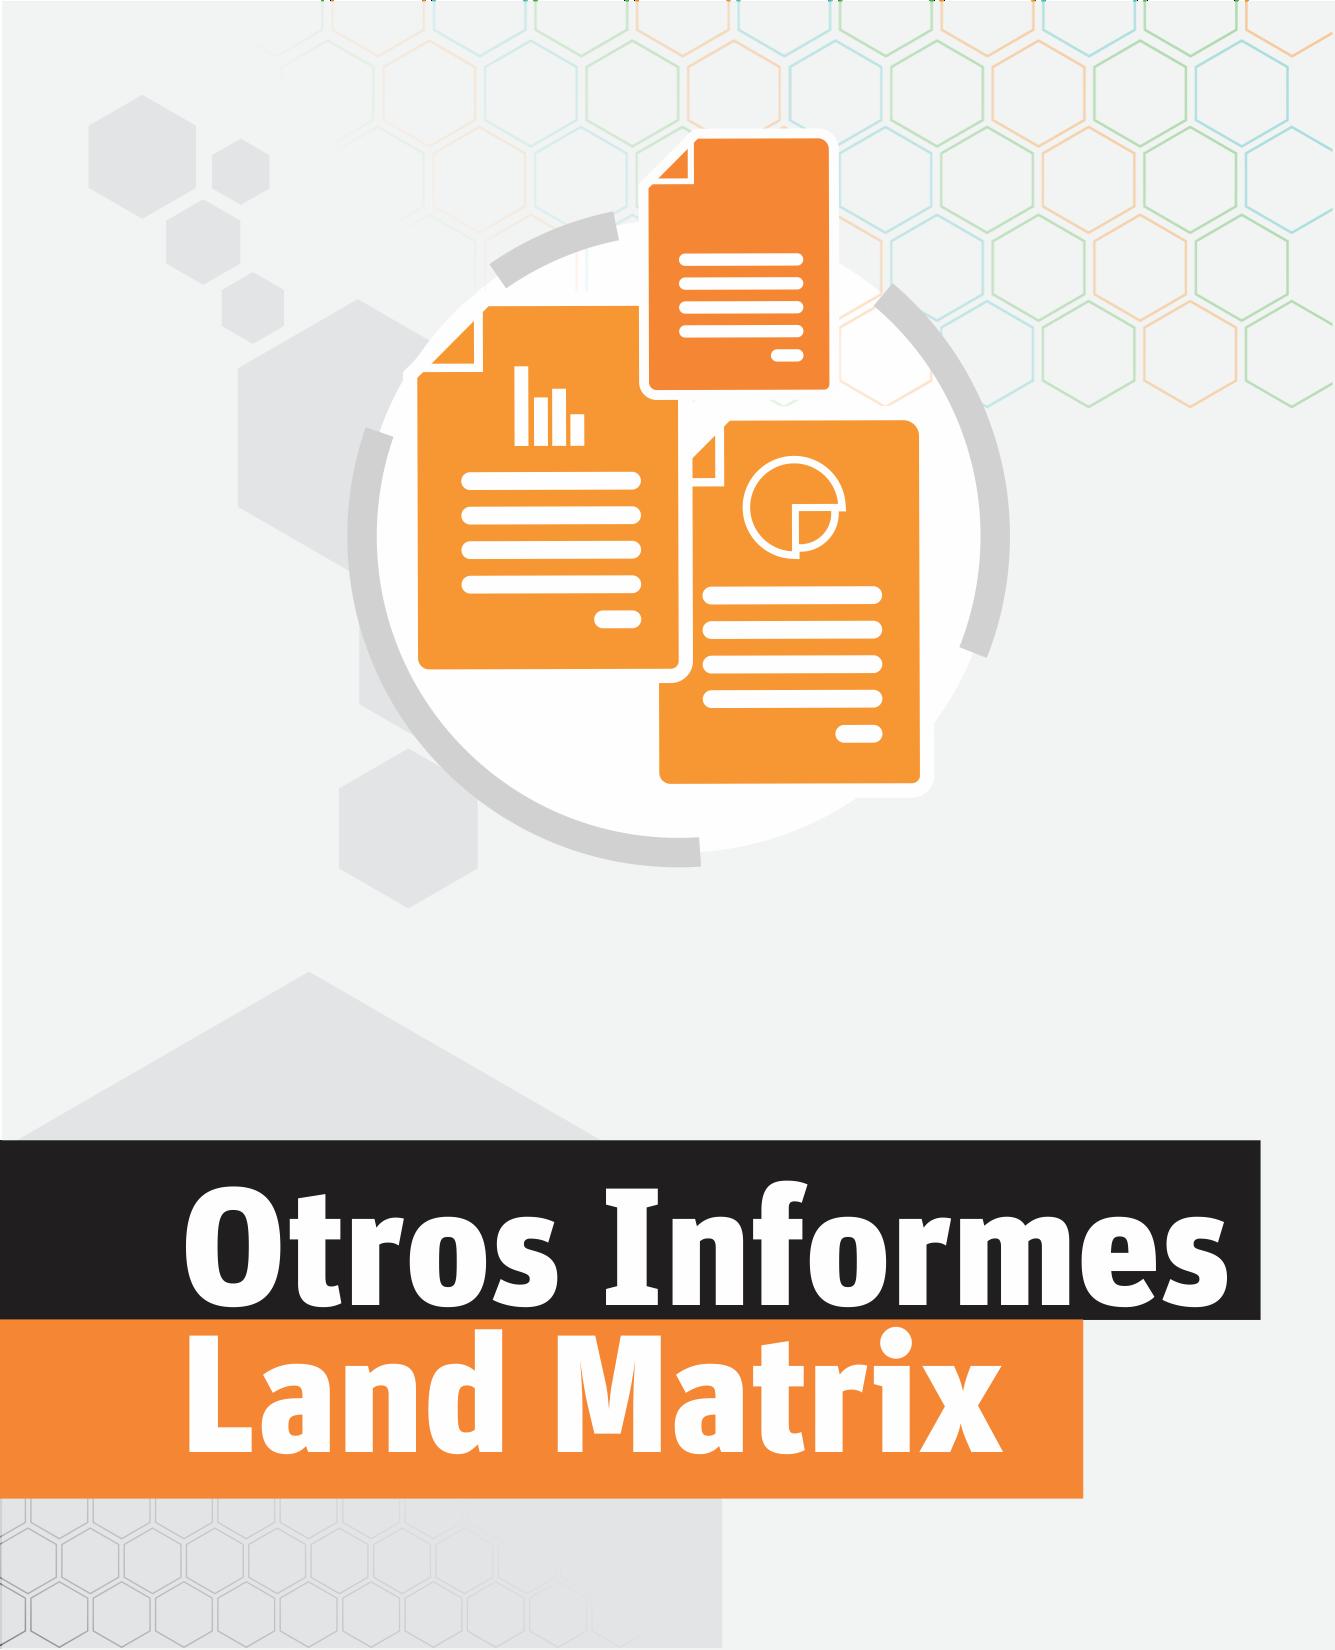 Otros Informes Land Matrix